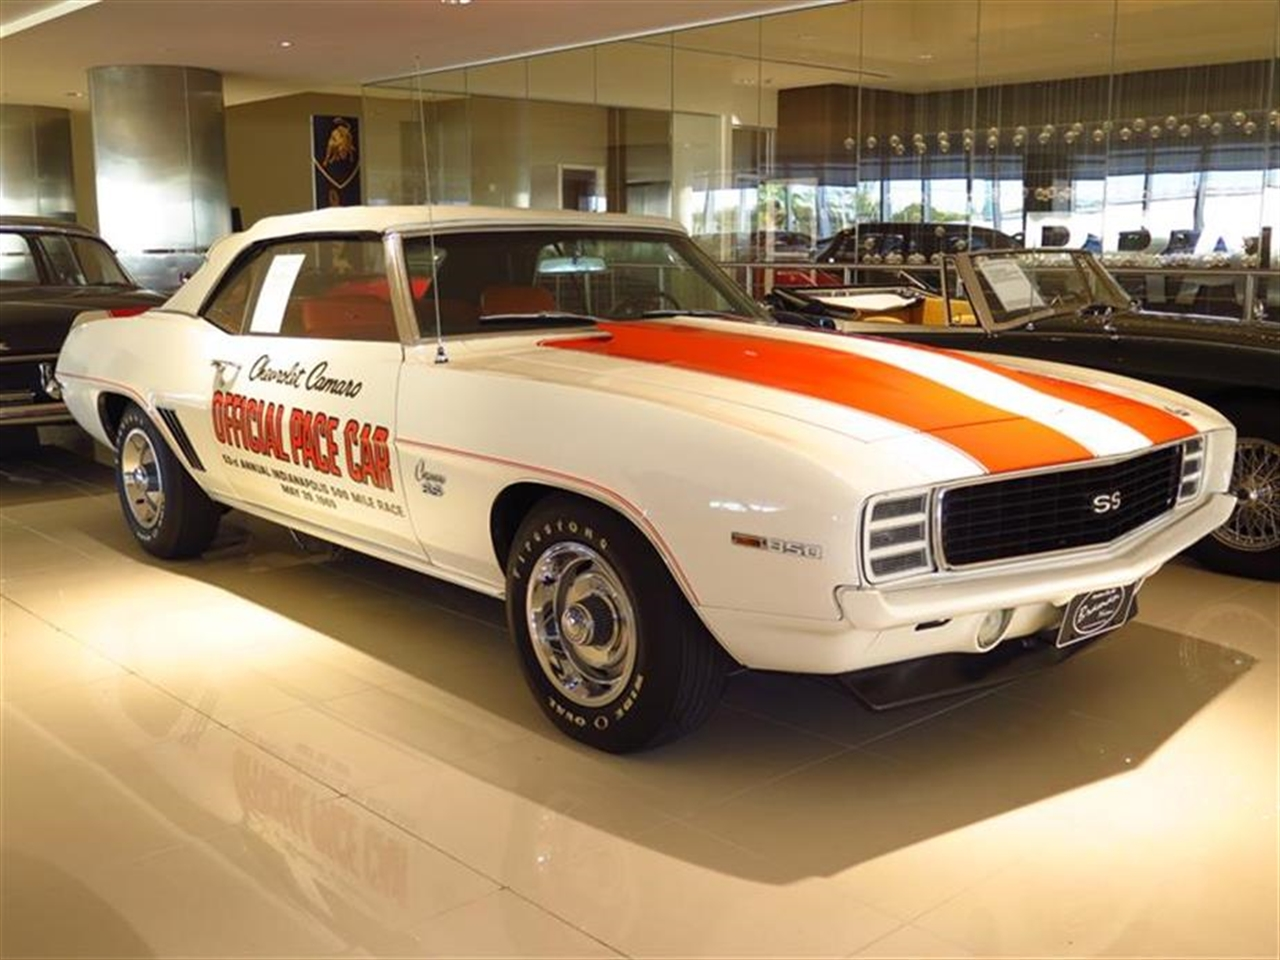 1969 CHEVROLET CAMARO 76662 miles VIN 124679N631711